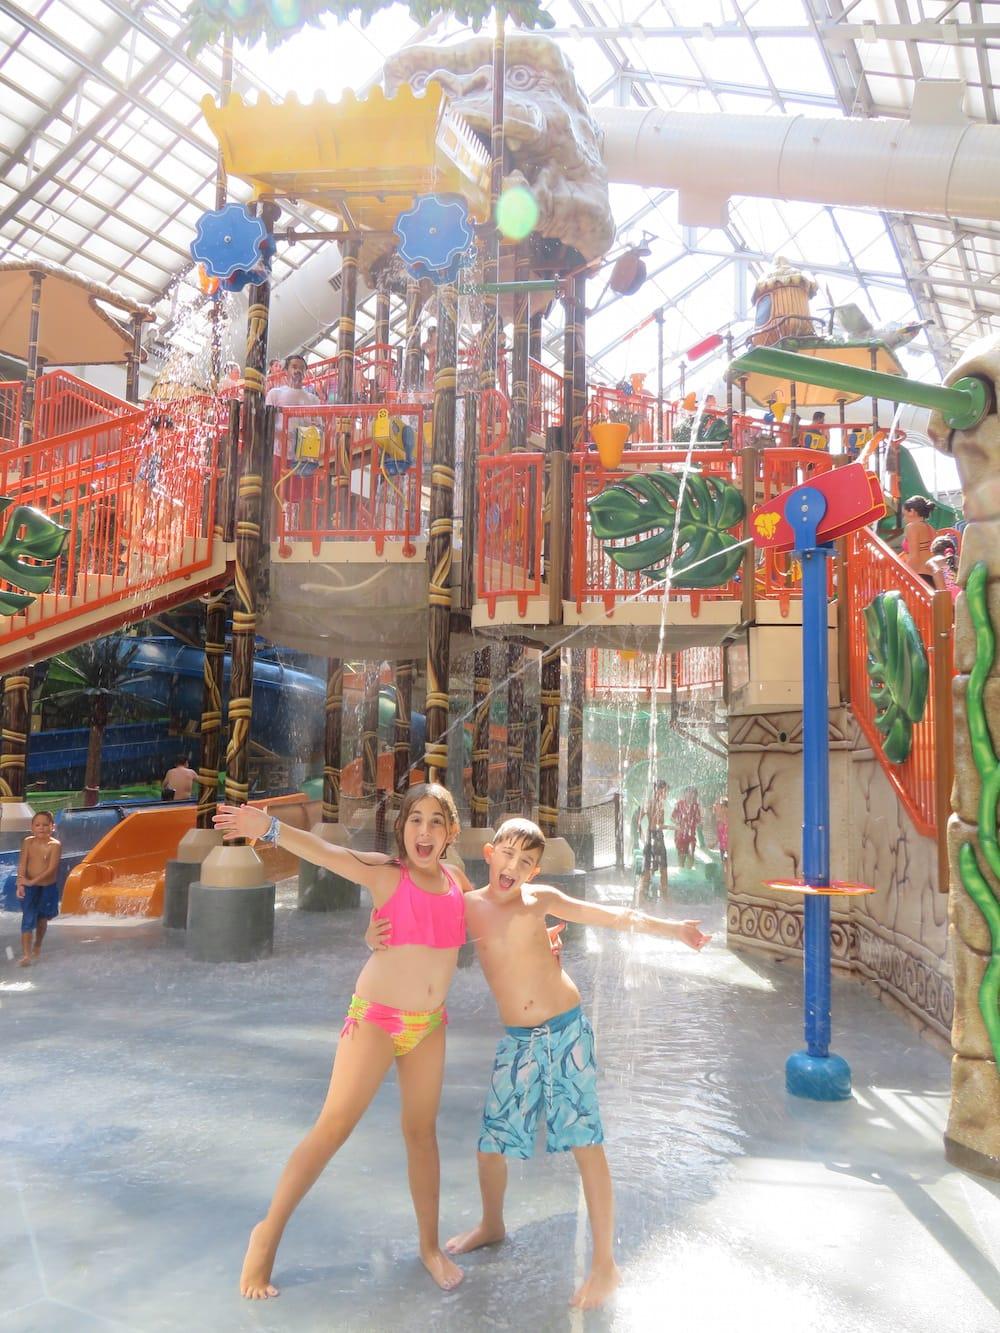 Kalahari Resorts In The Poconos: Water Park Fun For The